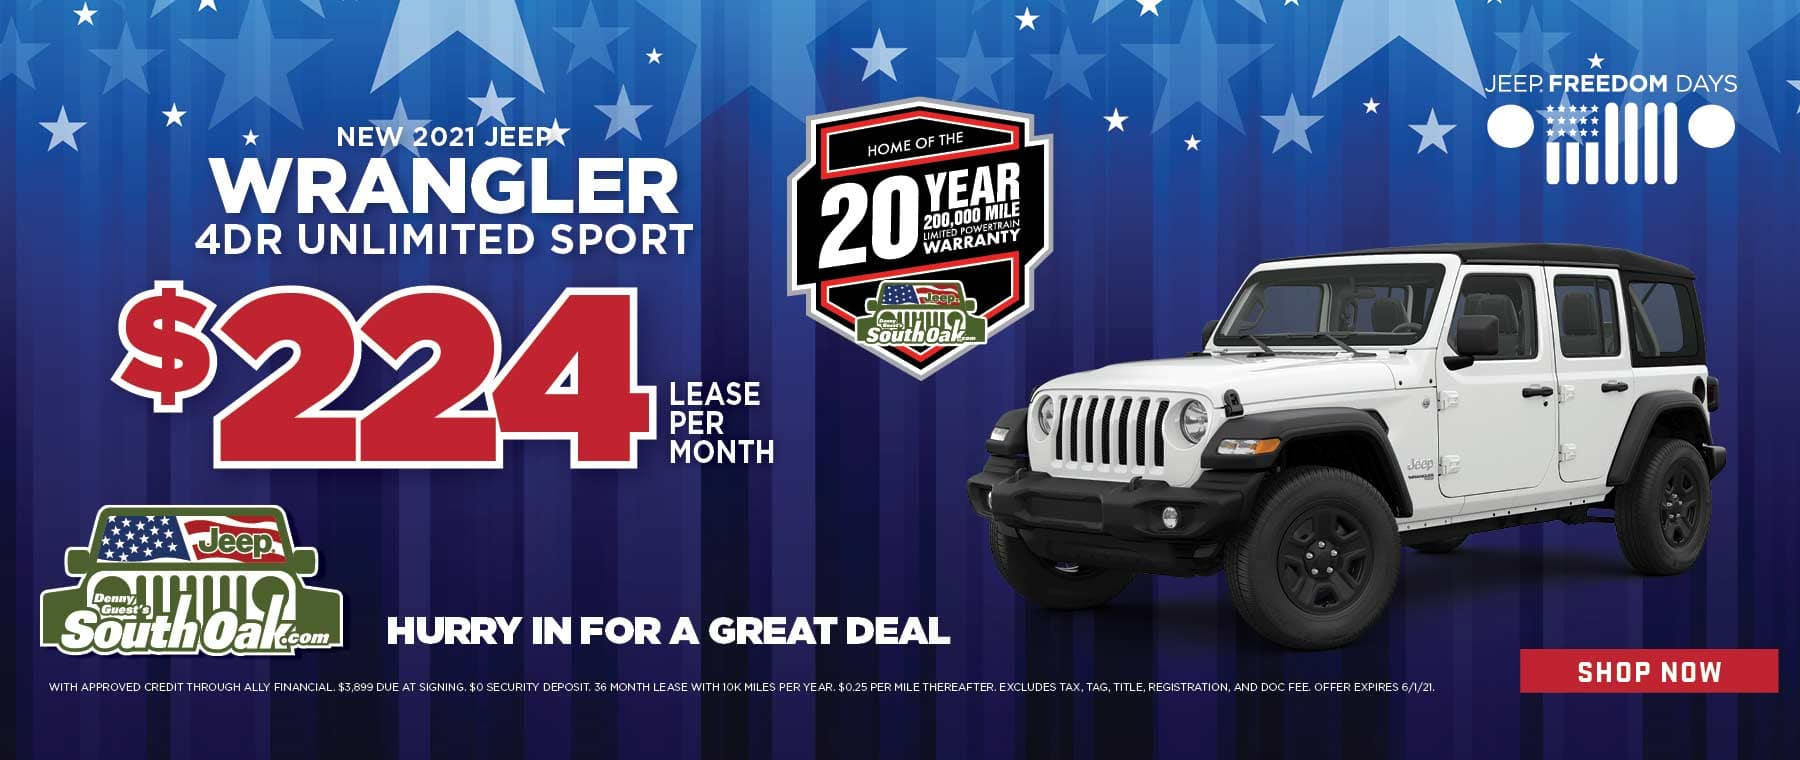 2021 Jeep Wrangler Unlimited Sport deal